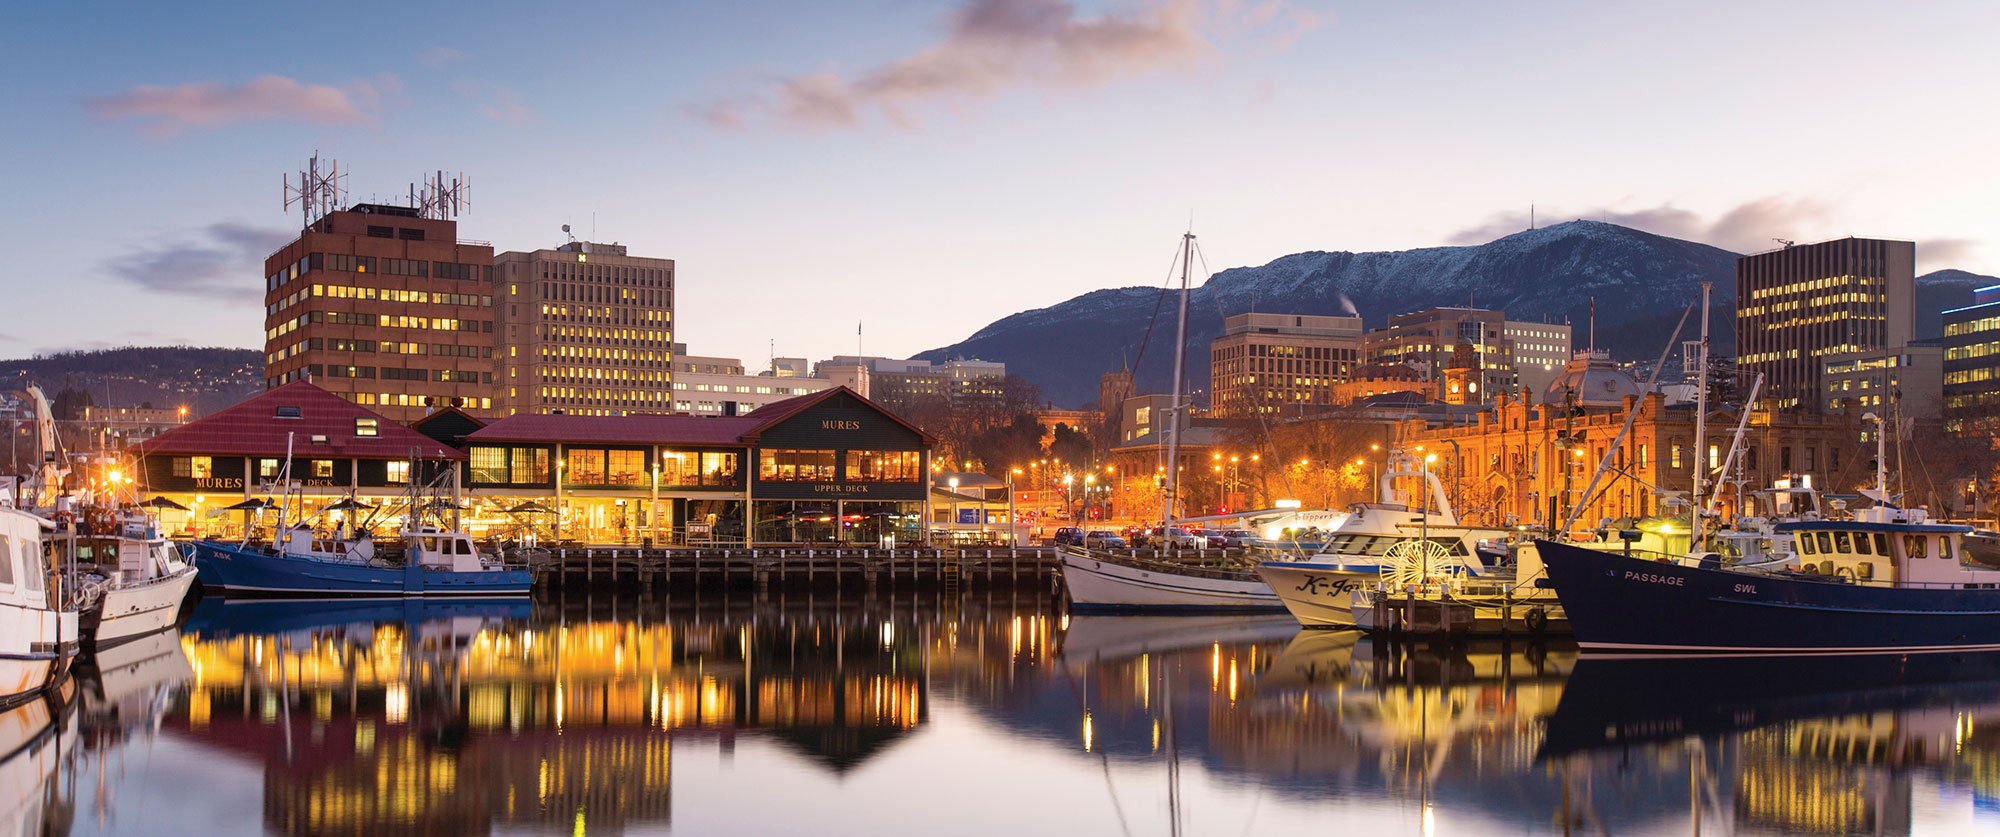 Australia Cook Islands Getaway - Hobart Tasmania